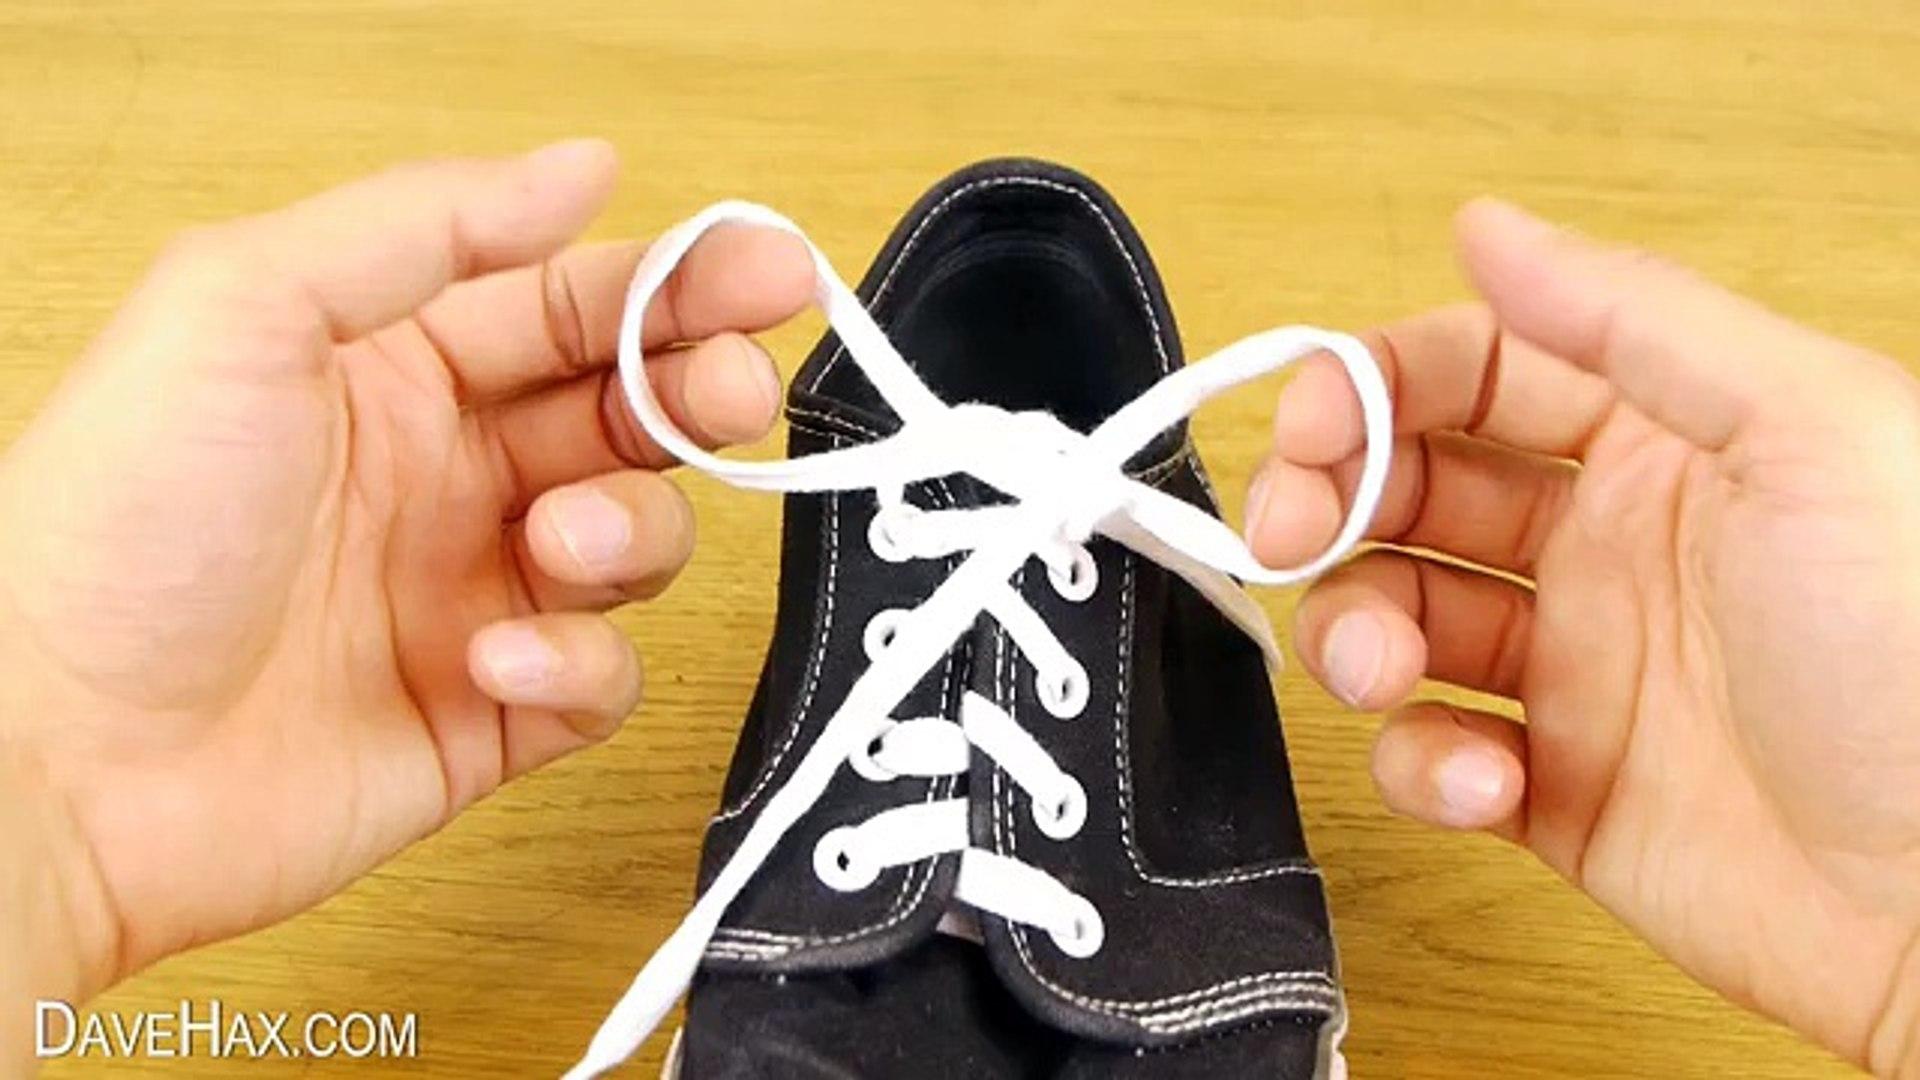 How To Tie Shoe Laces  Teach Children Video.